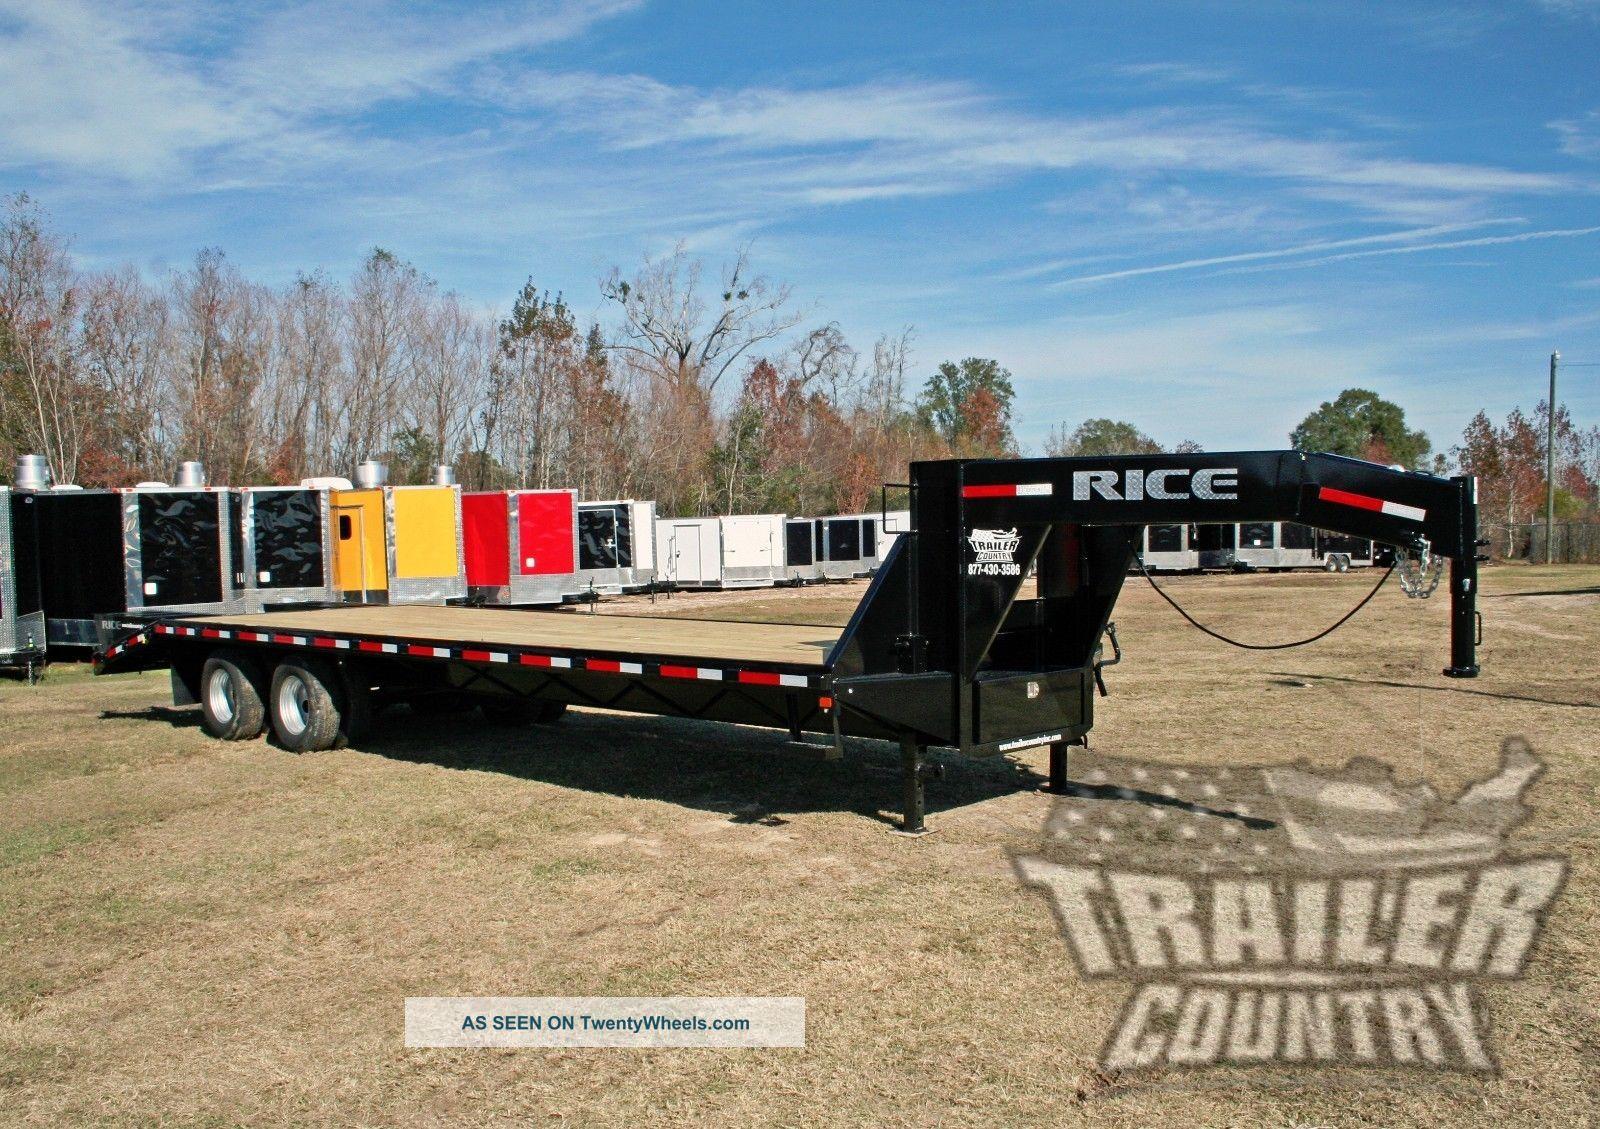 2017 10 Ton 30 ' Flat Bed Deck Over Equipment Dual Axle Gooseneck Trailer 20k Trailers photo